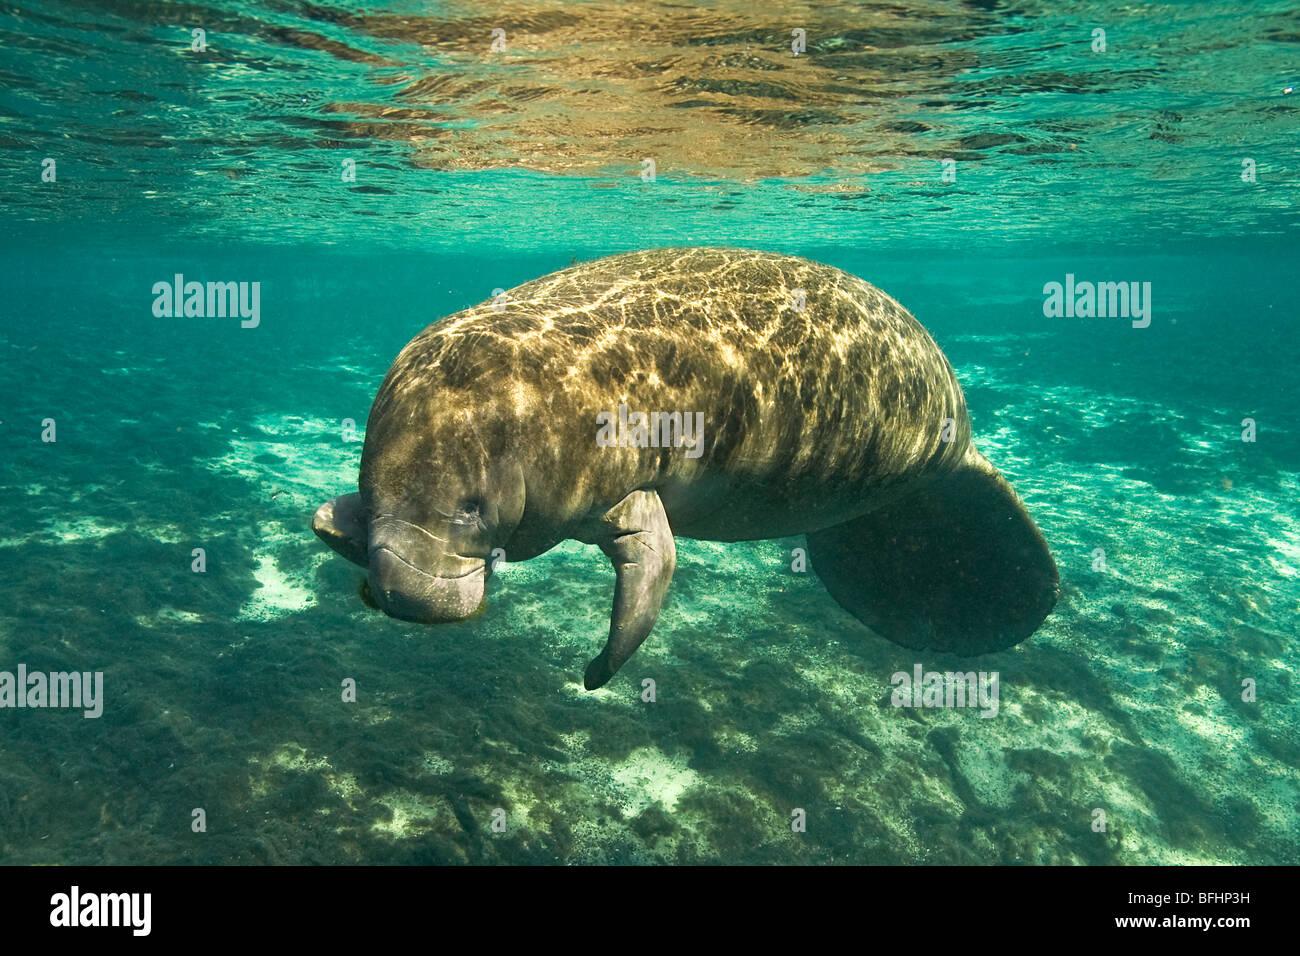 Florida manatee (Trichechus manatus latirostris) eating algae, Crystal River, west-central Florida, U.S.A. - Stock Image